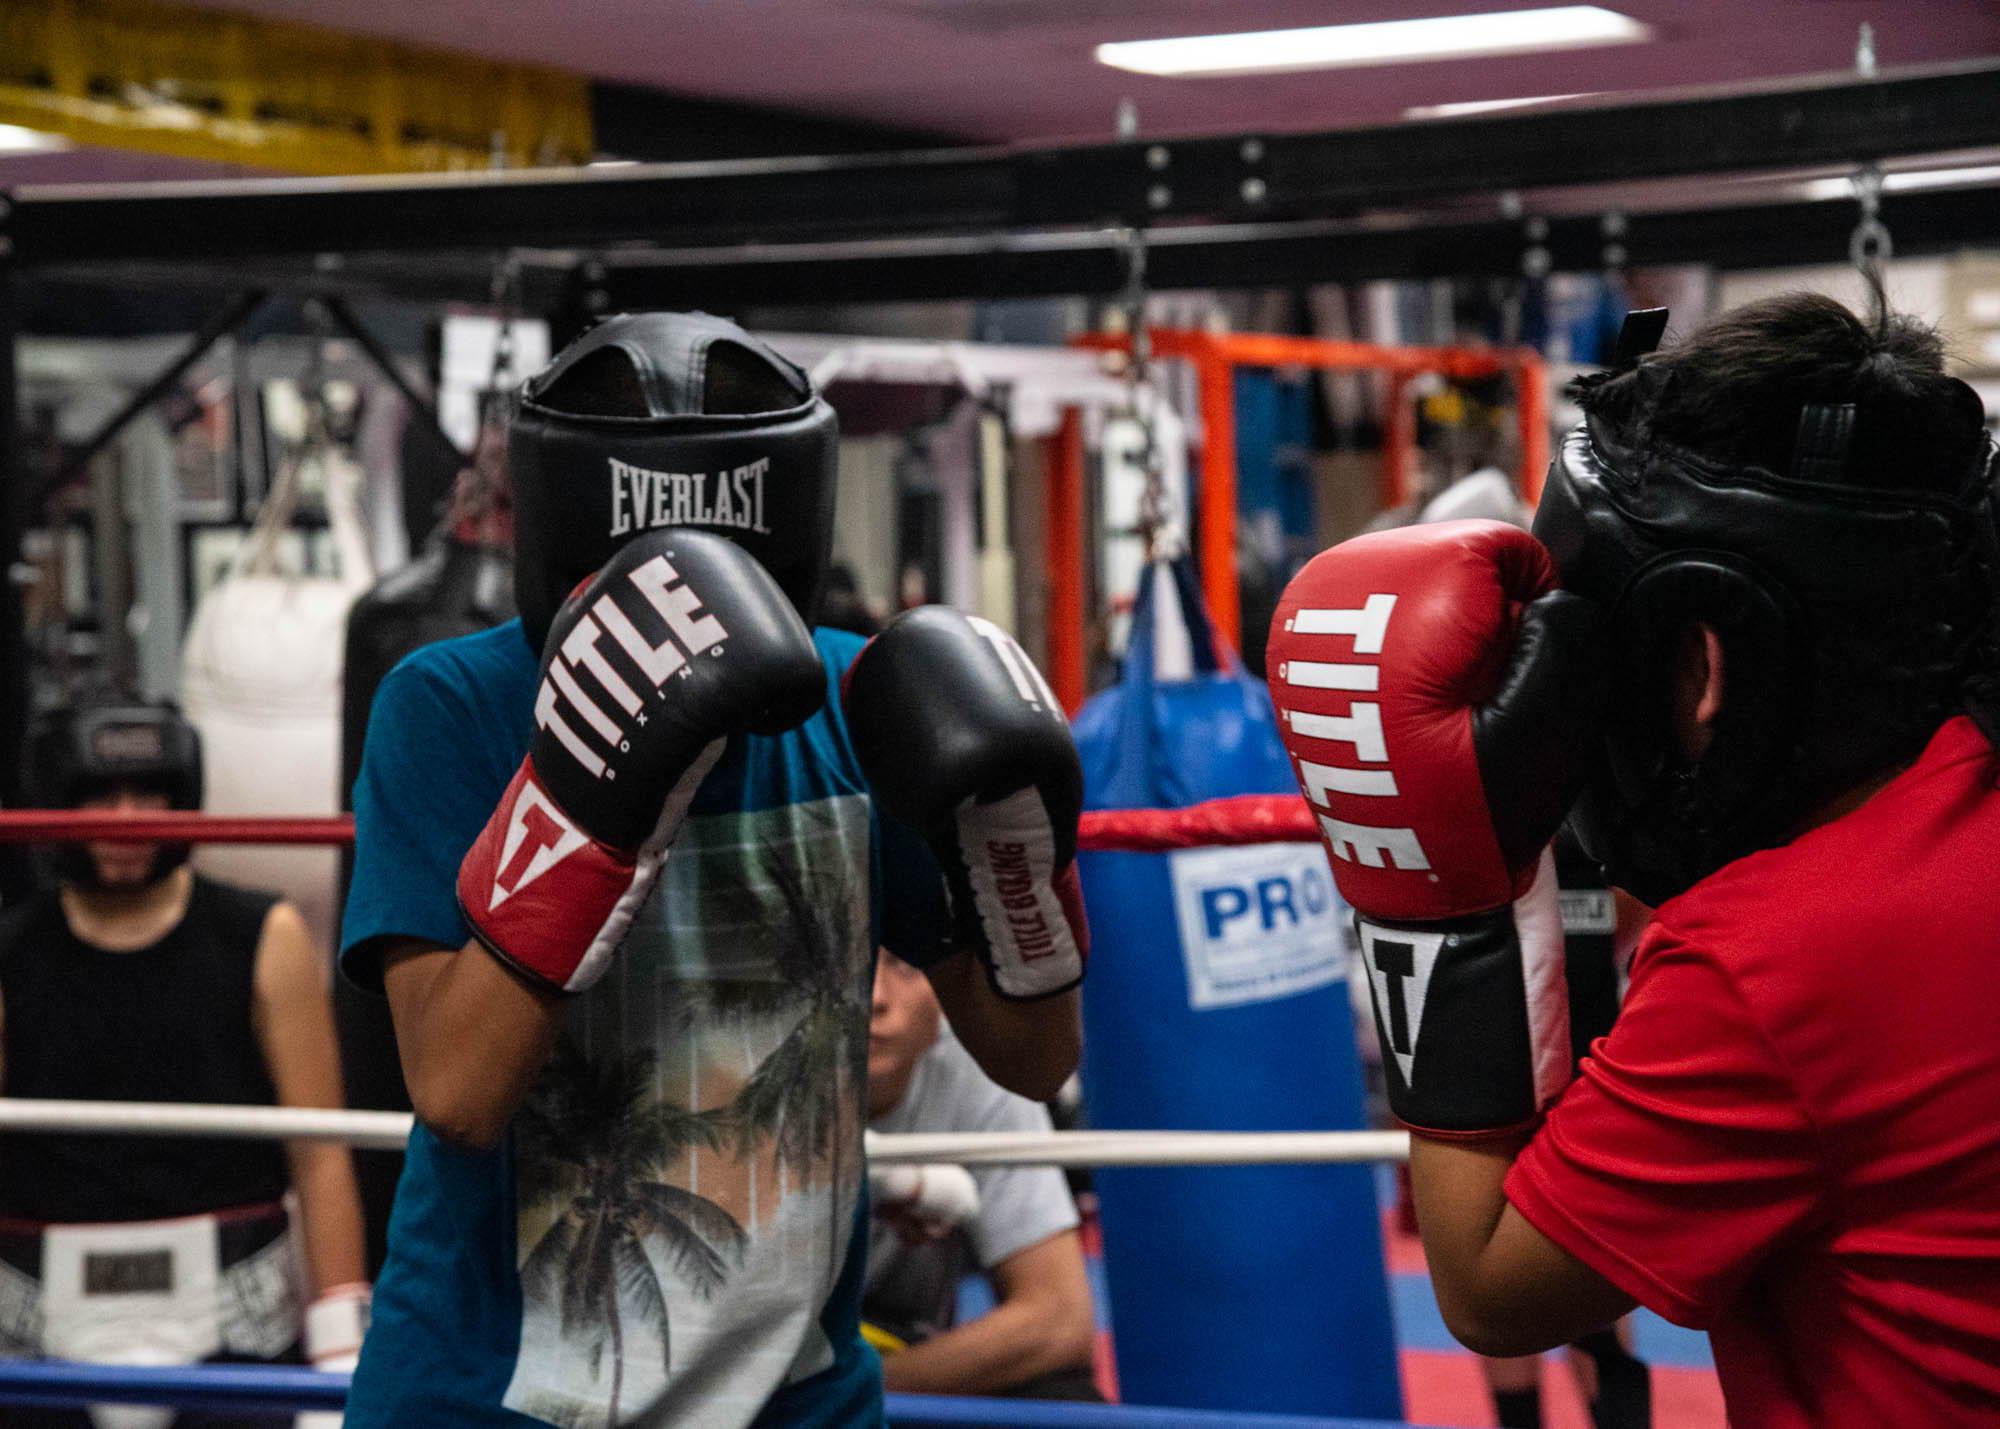 O.C. Boxing